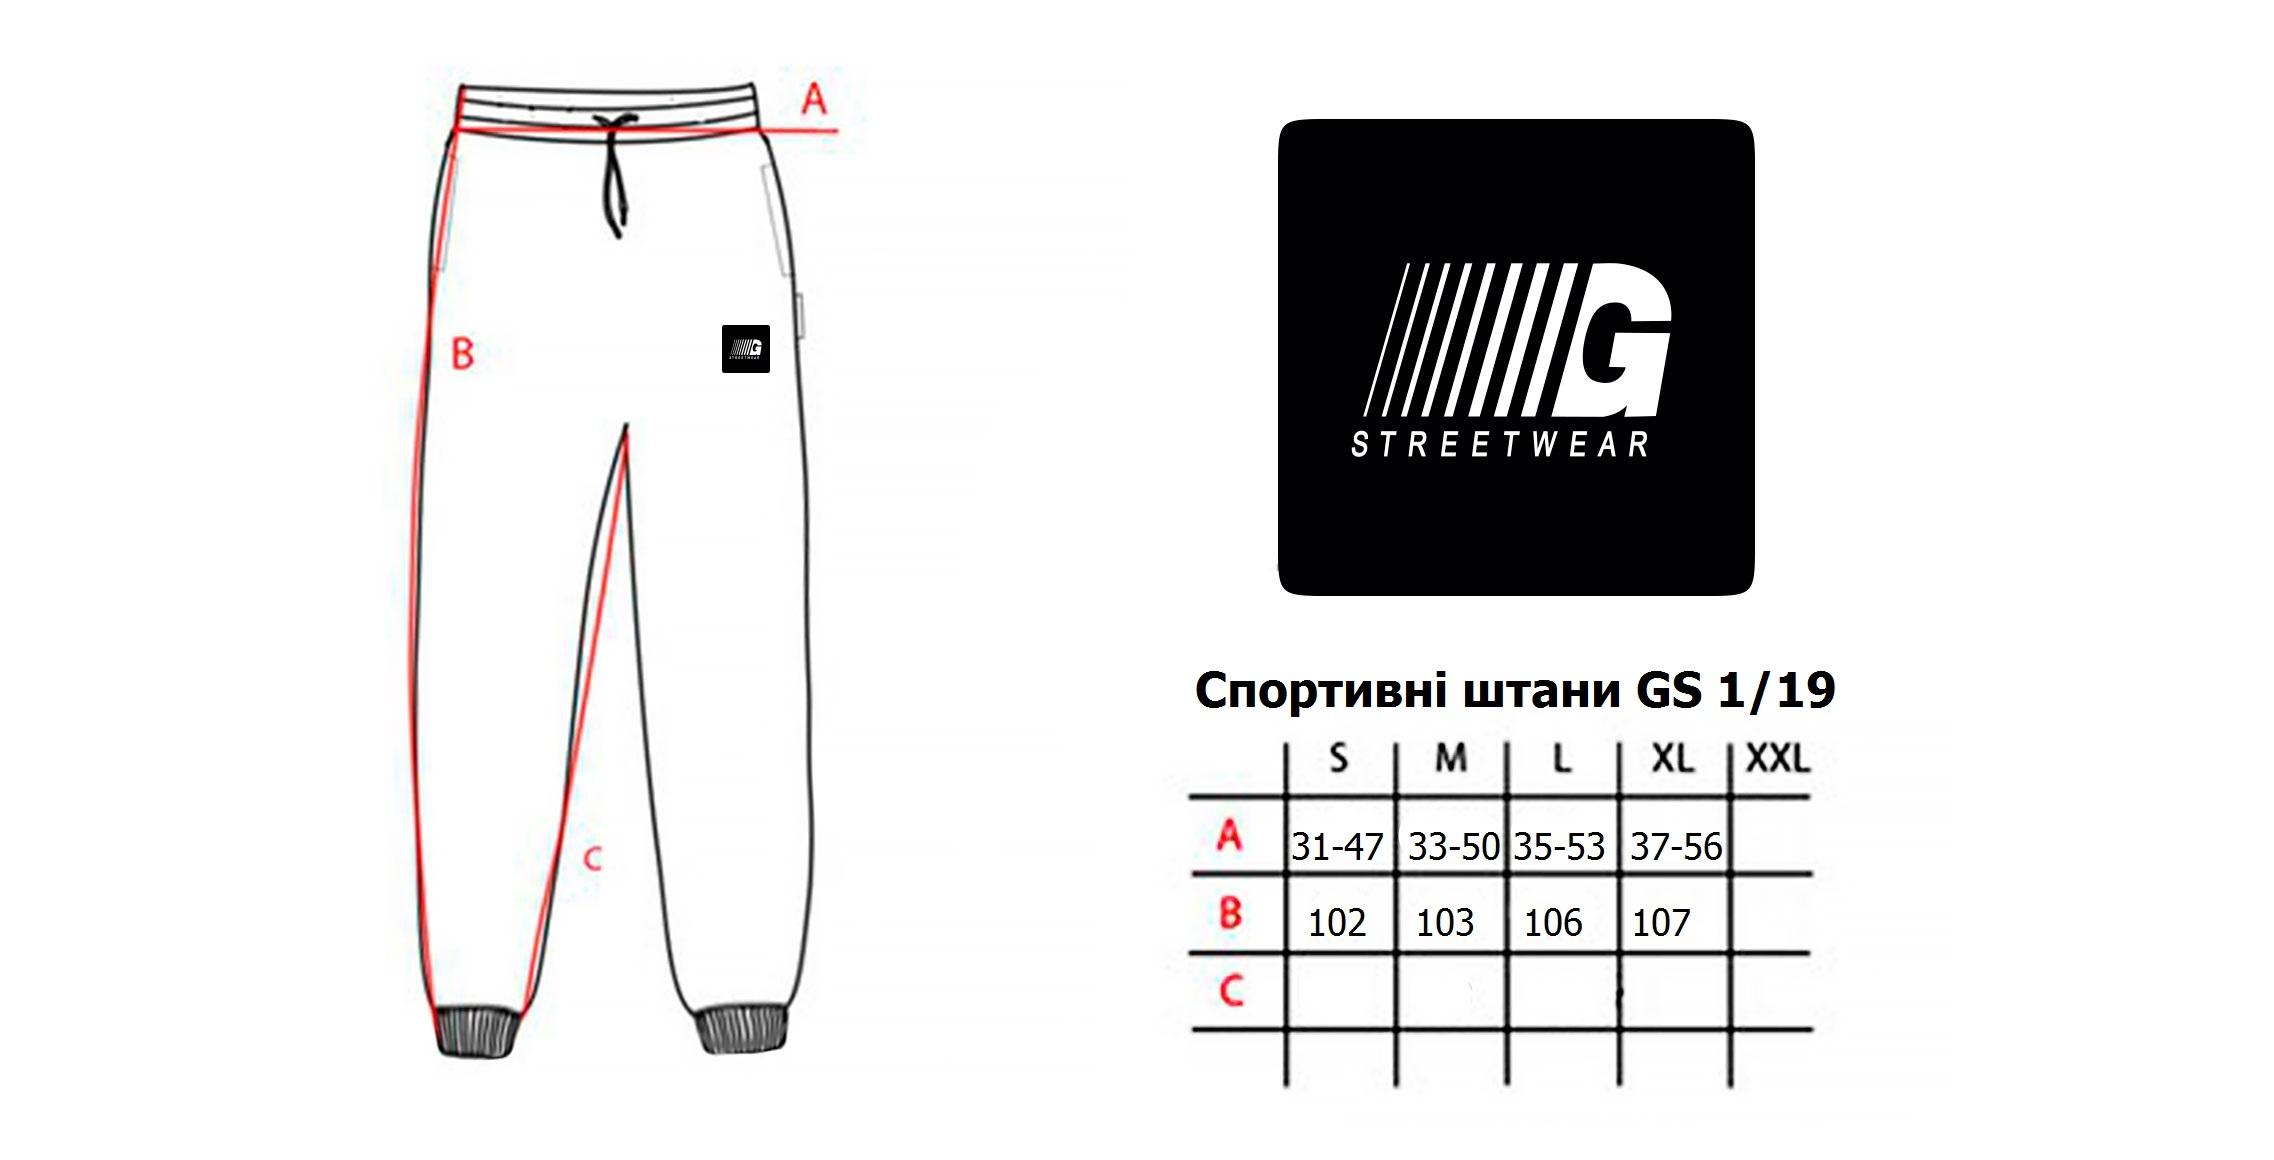 Спортивні штани GS flecce 1 19  f573afdc41ad1